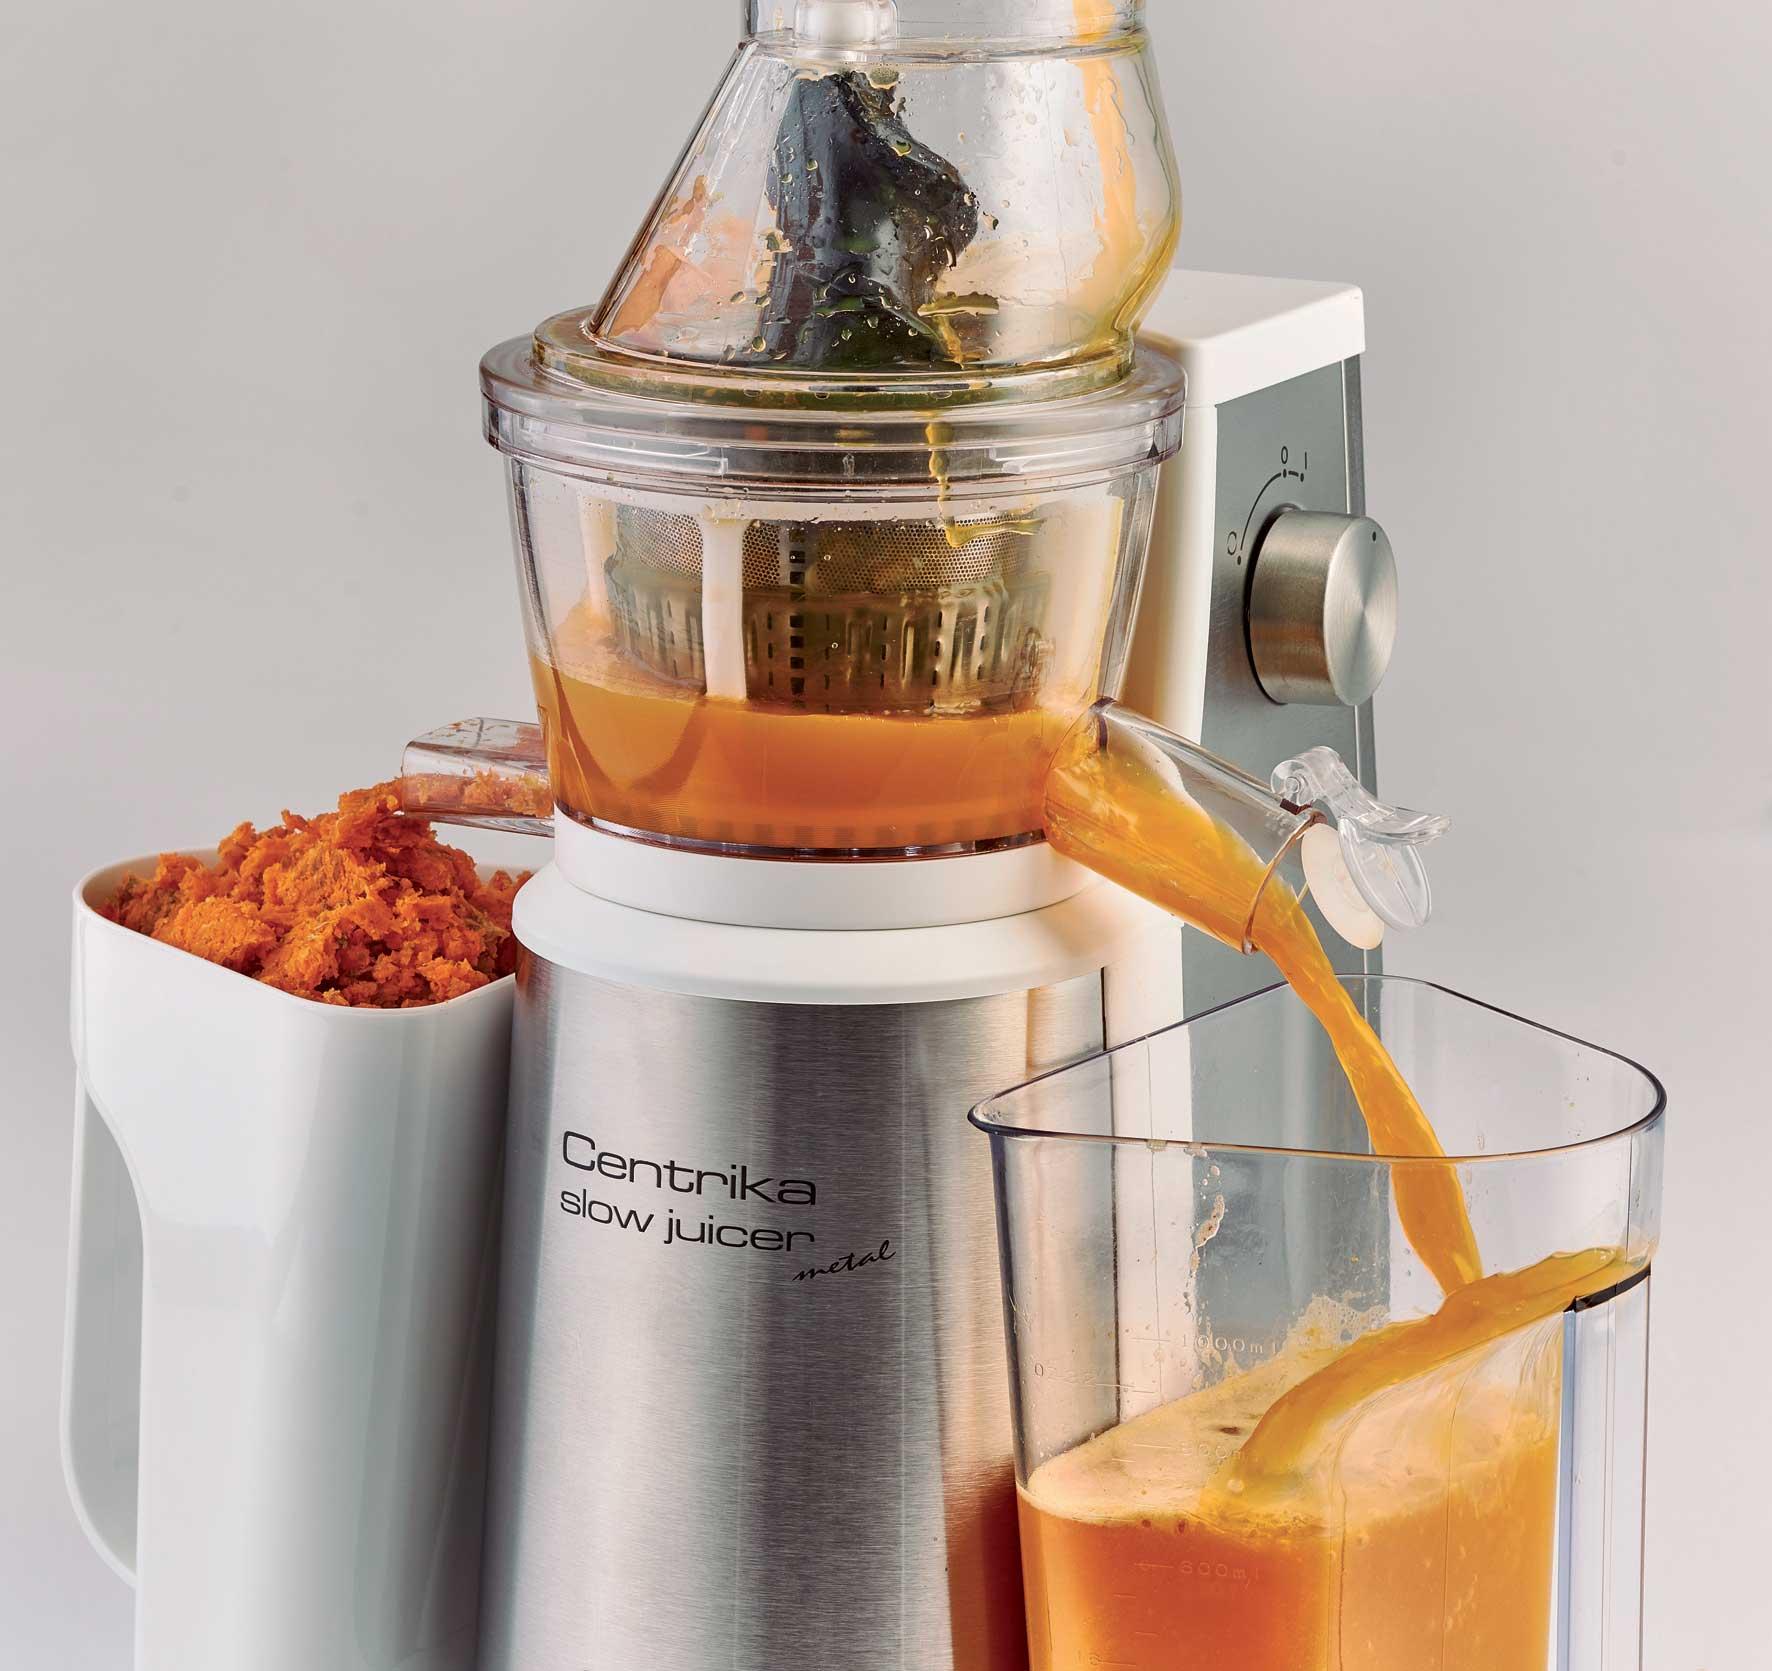 Filtro Slow Juicer Mondial : Centrika Slow Juicer Metal - Ariete Store